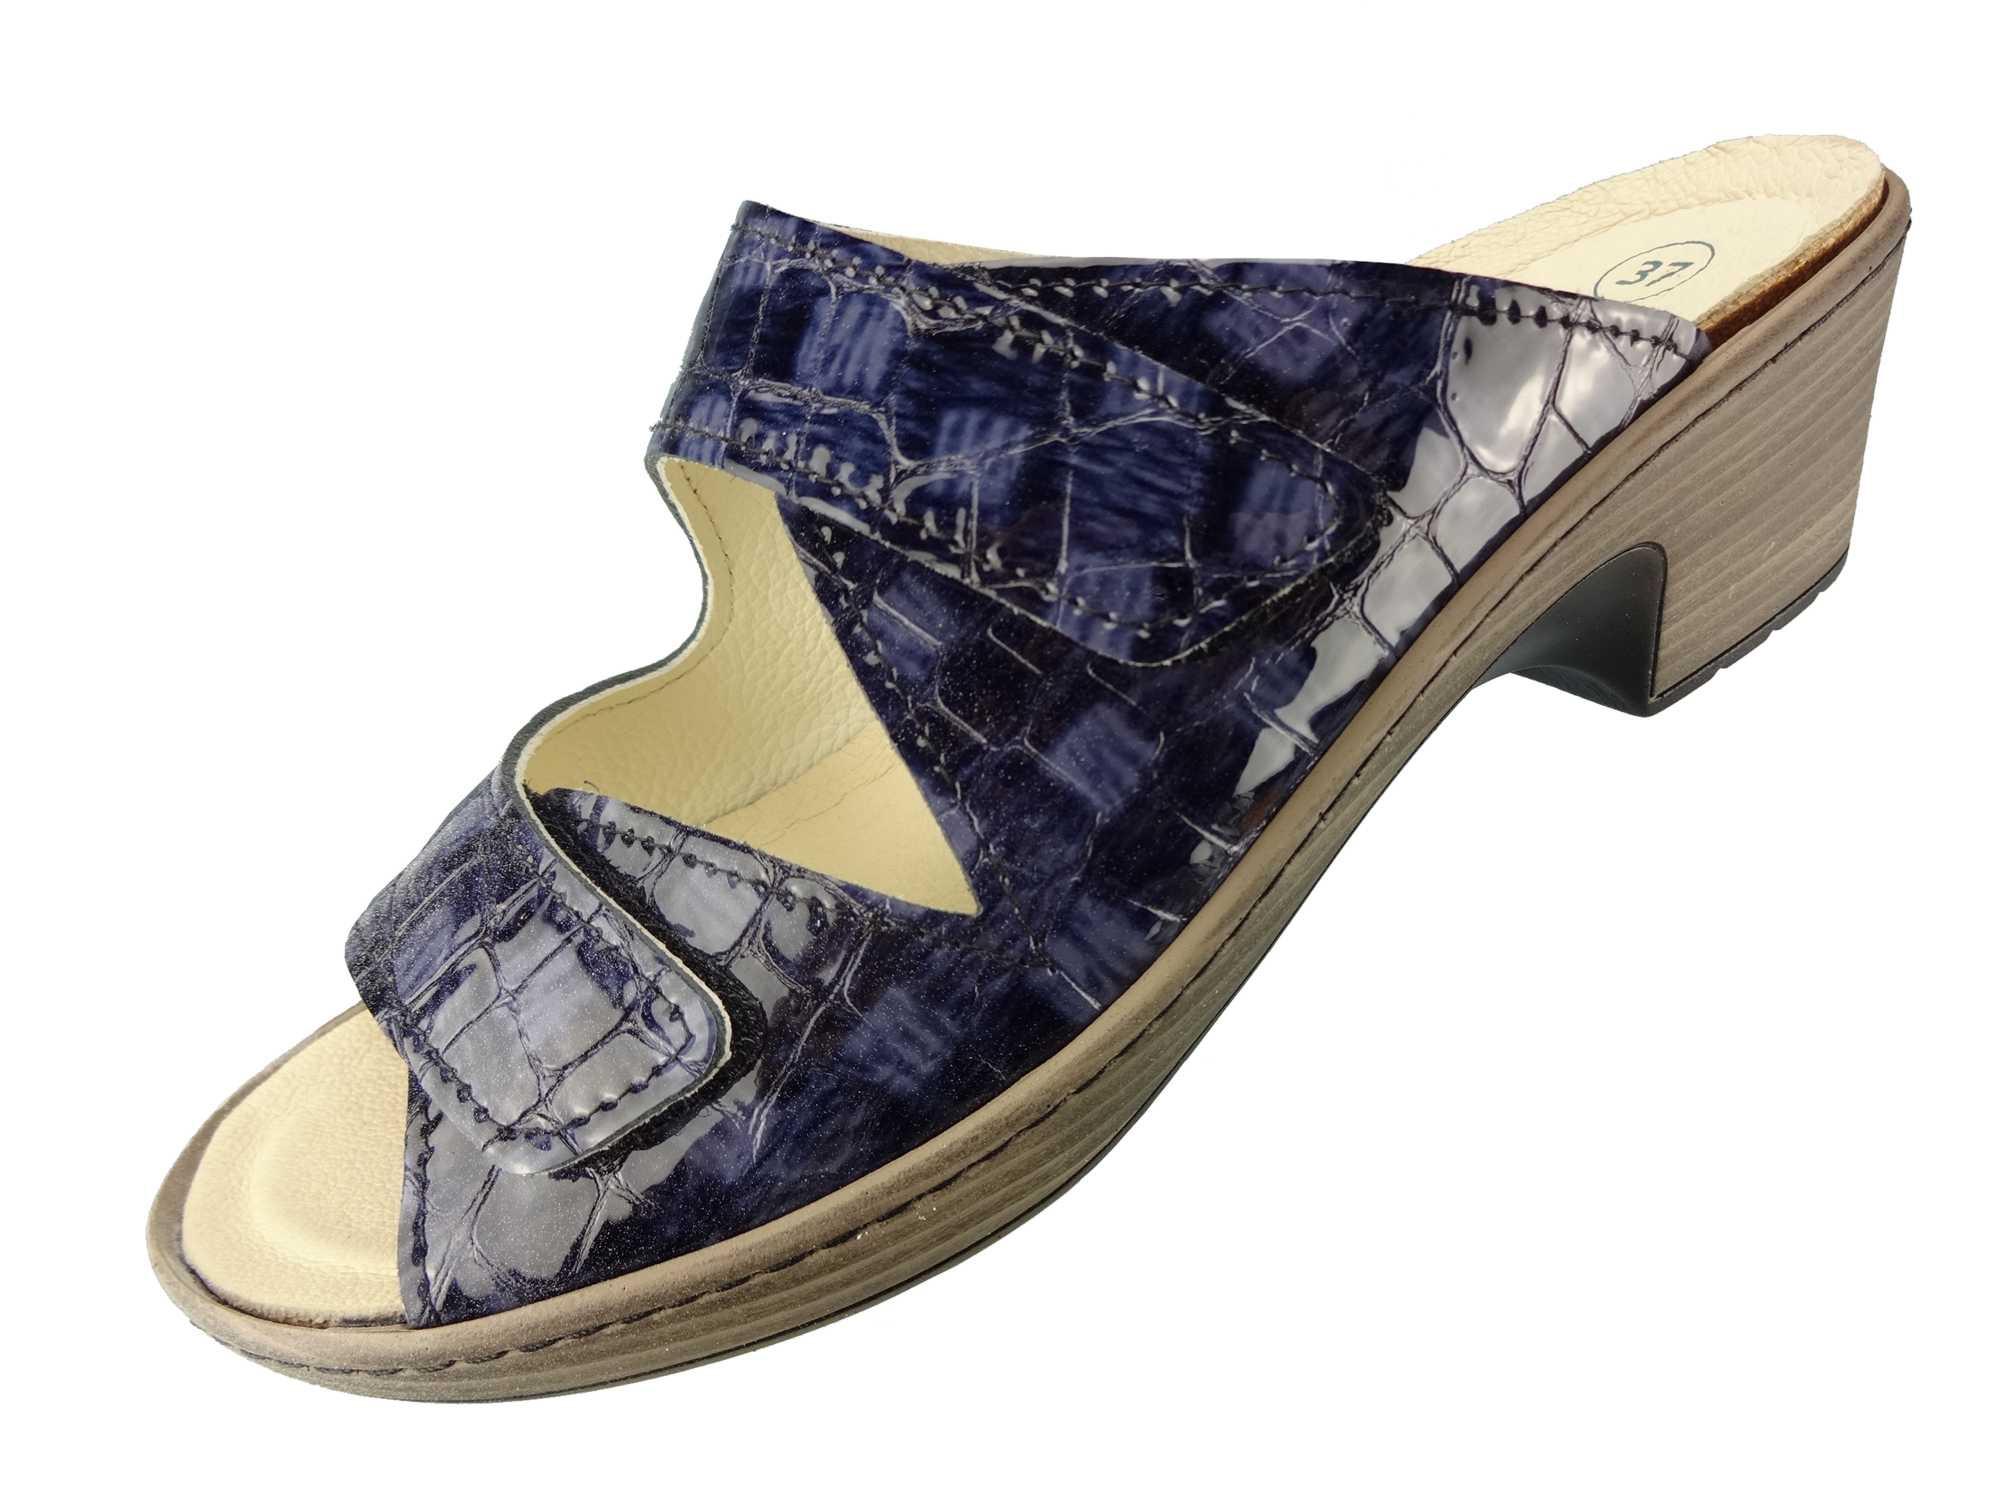 "Algemare Damen Leder Pantolette ""Atlantik Kroko"" Keilpantolette mit Algen-Kork Wechselfußbett Made in Germany 6118_8267"